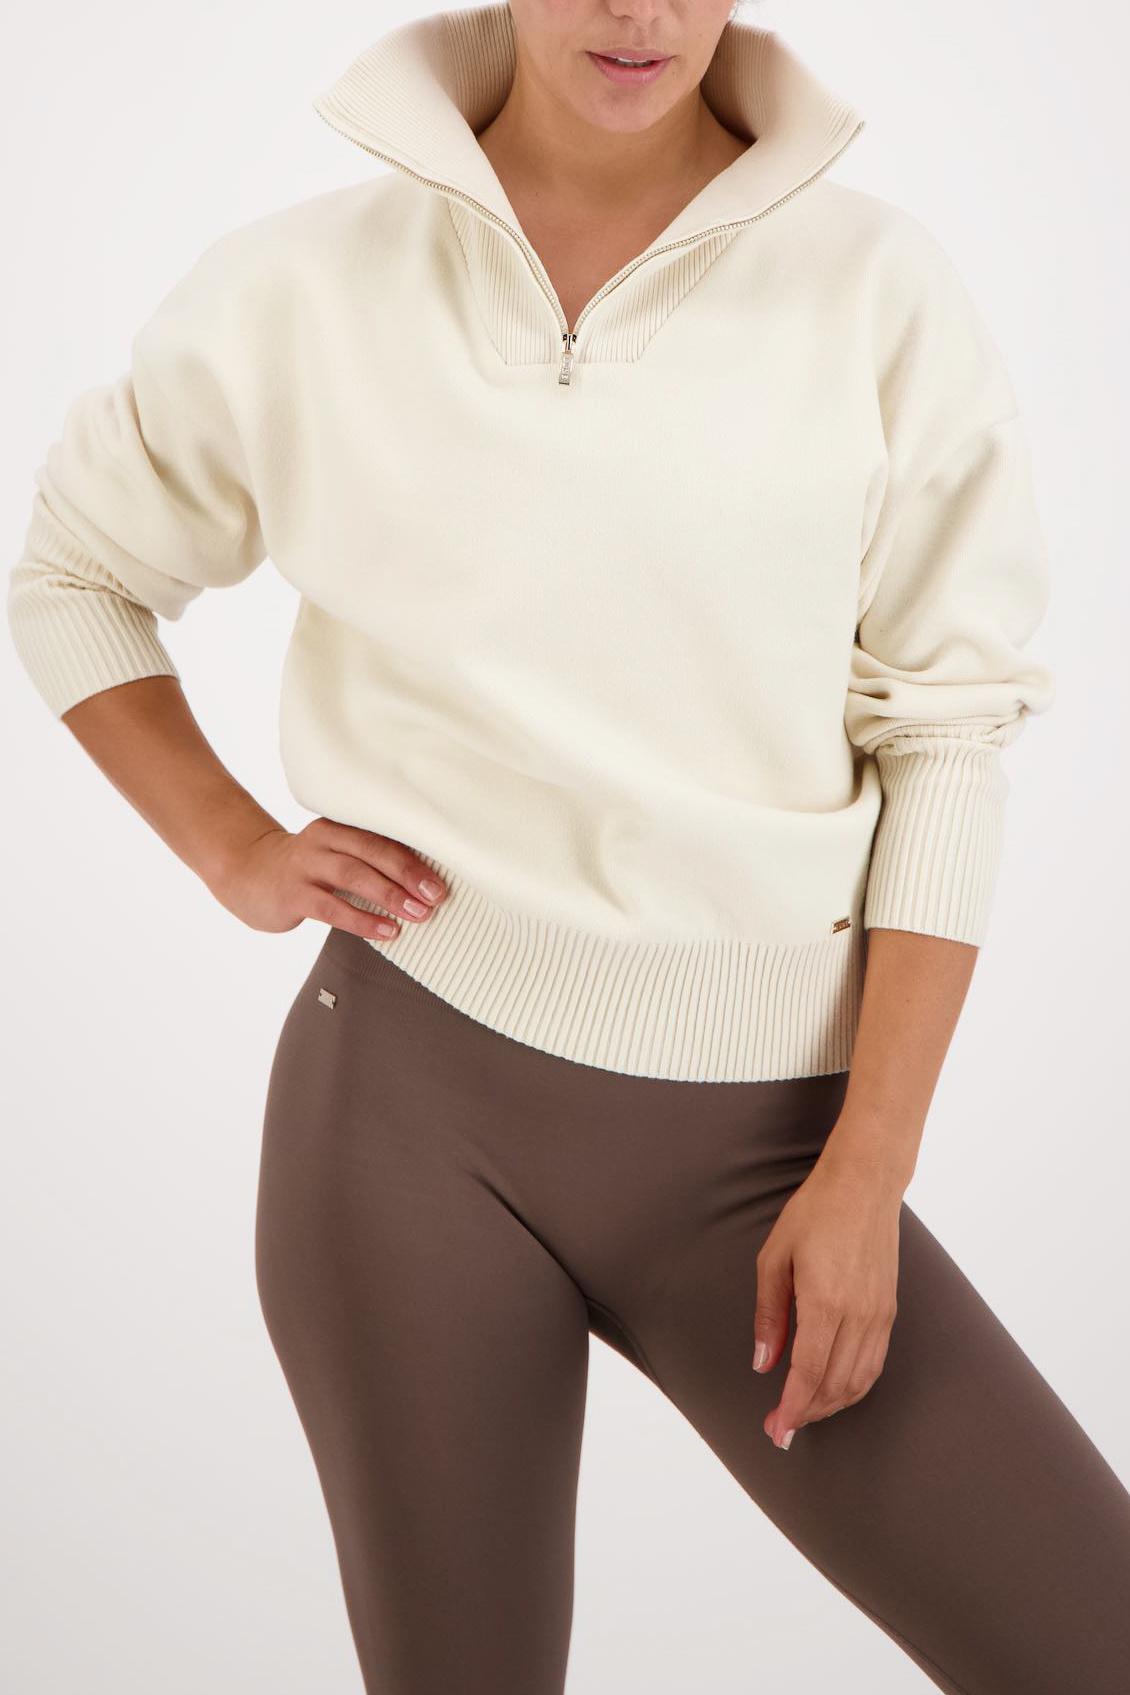 Olly Half-Zip Knit Sweater - Cream White-1